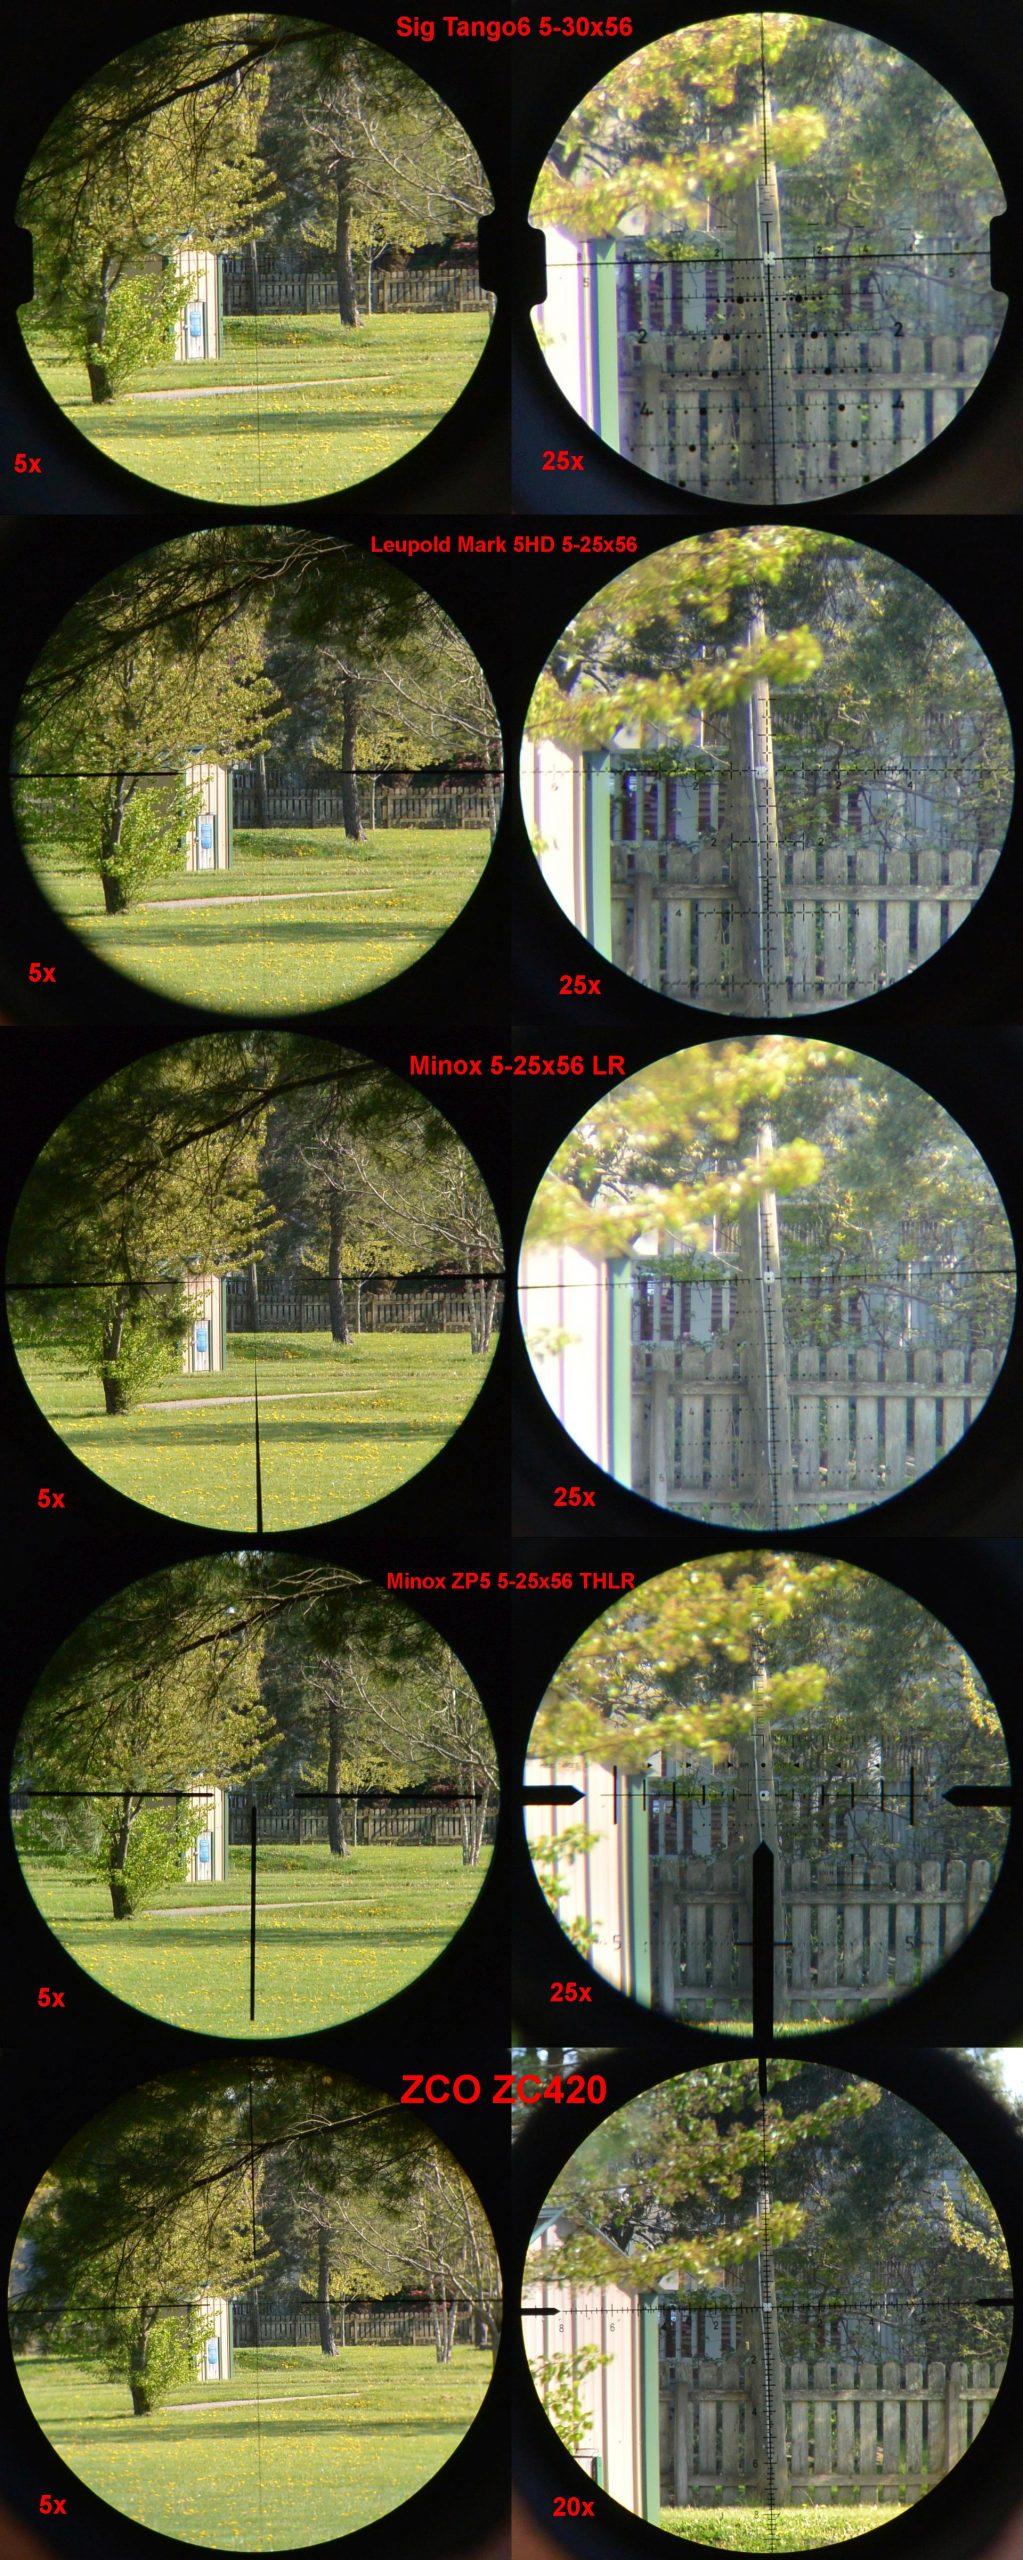 Field of view compilation image with: Sig Tango6 5-30x56, Leupold Mark 5HD 5-25x56, Minox 5-25x56 LR, Minox ZP5 5-25x56 THLR, and ZCO ZC420